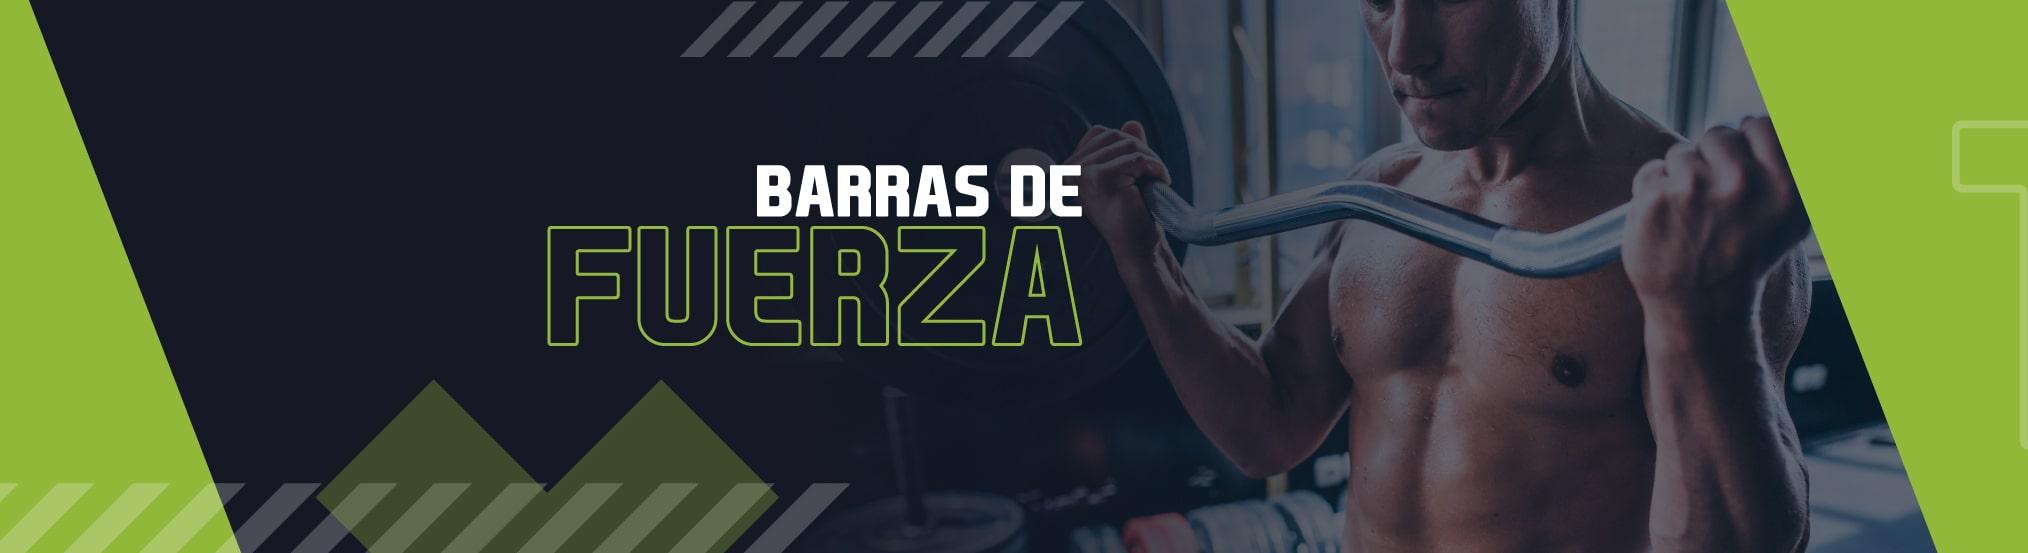 B-BARRAS-FUERZA-DESK-min